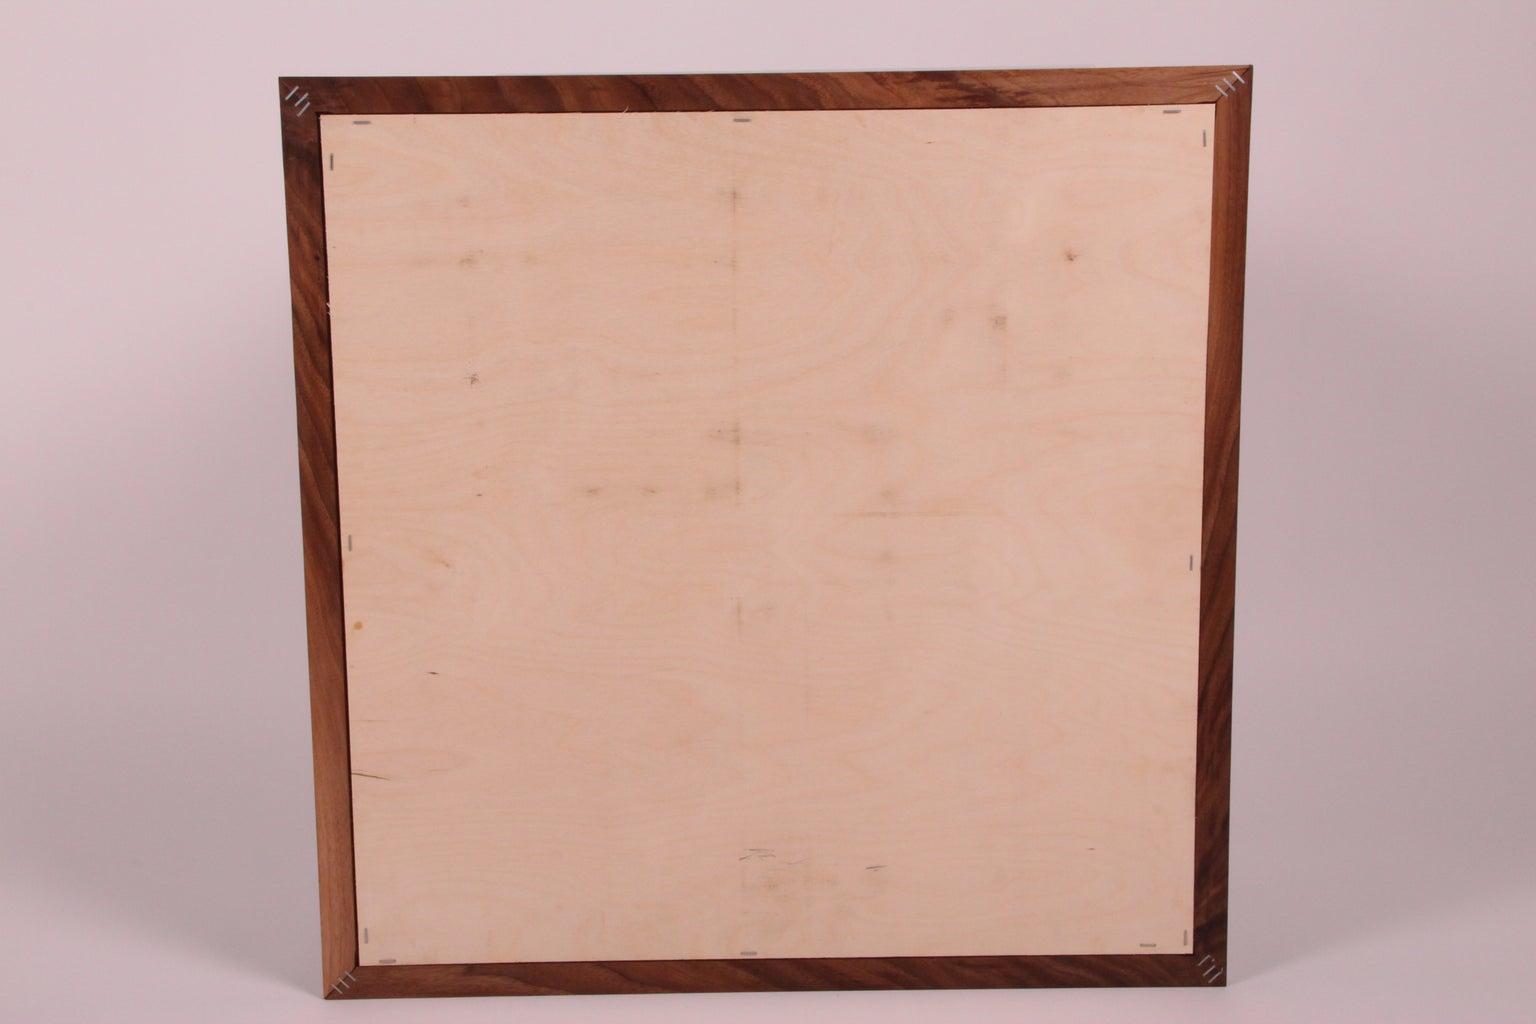 Make Frame for Board